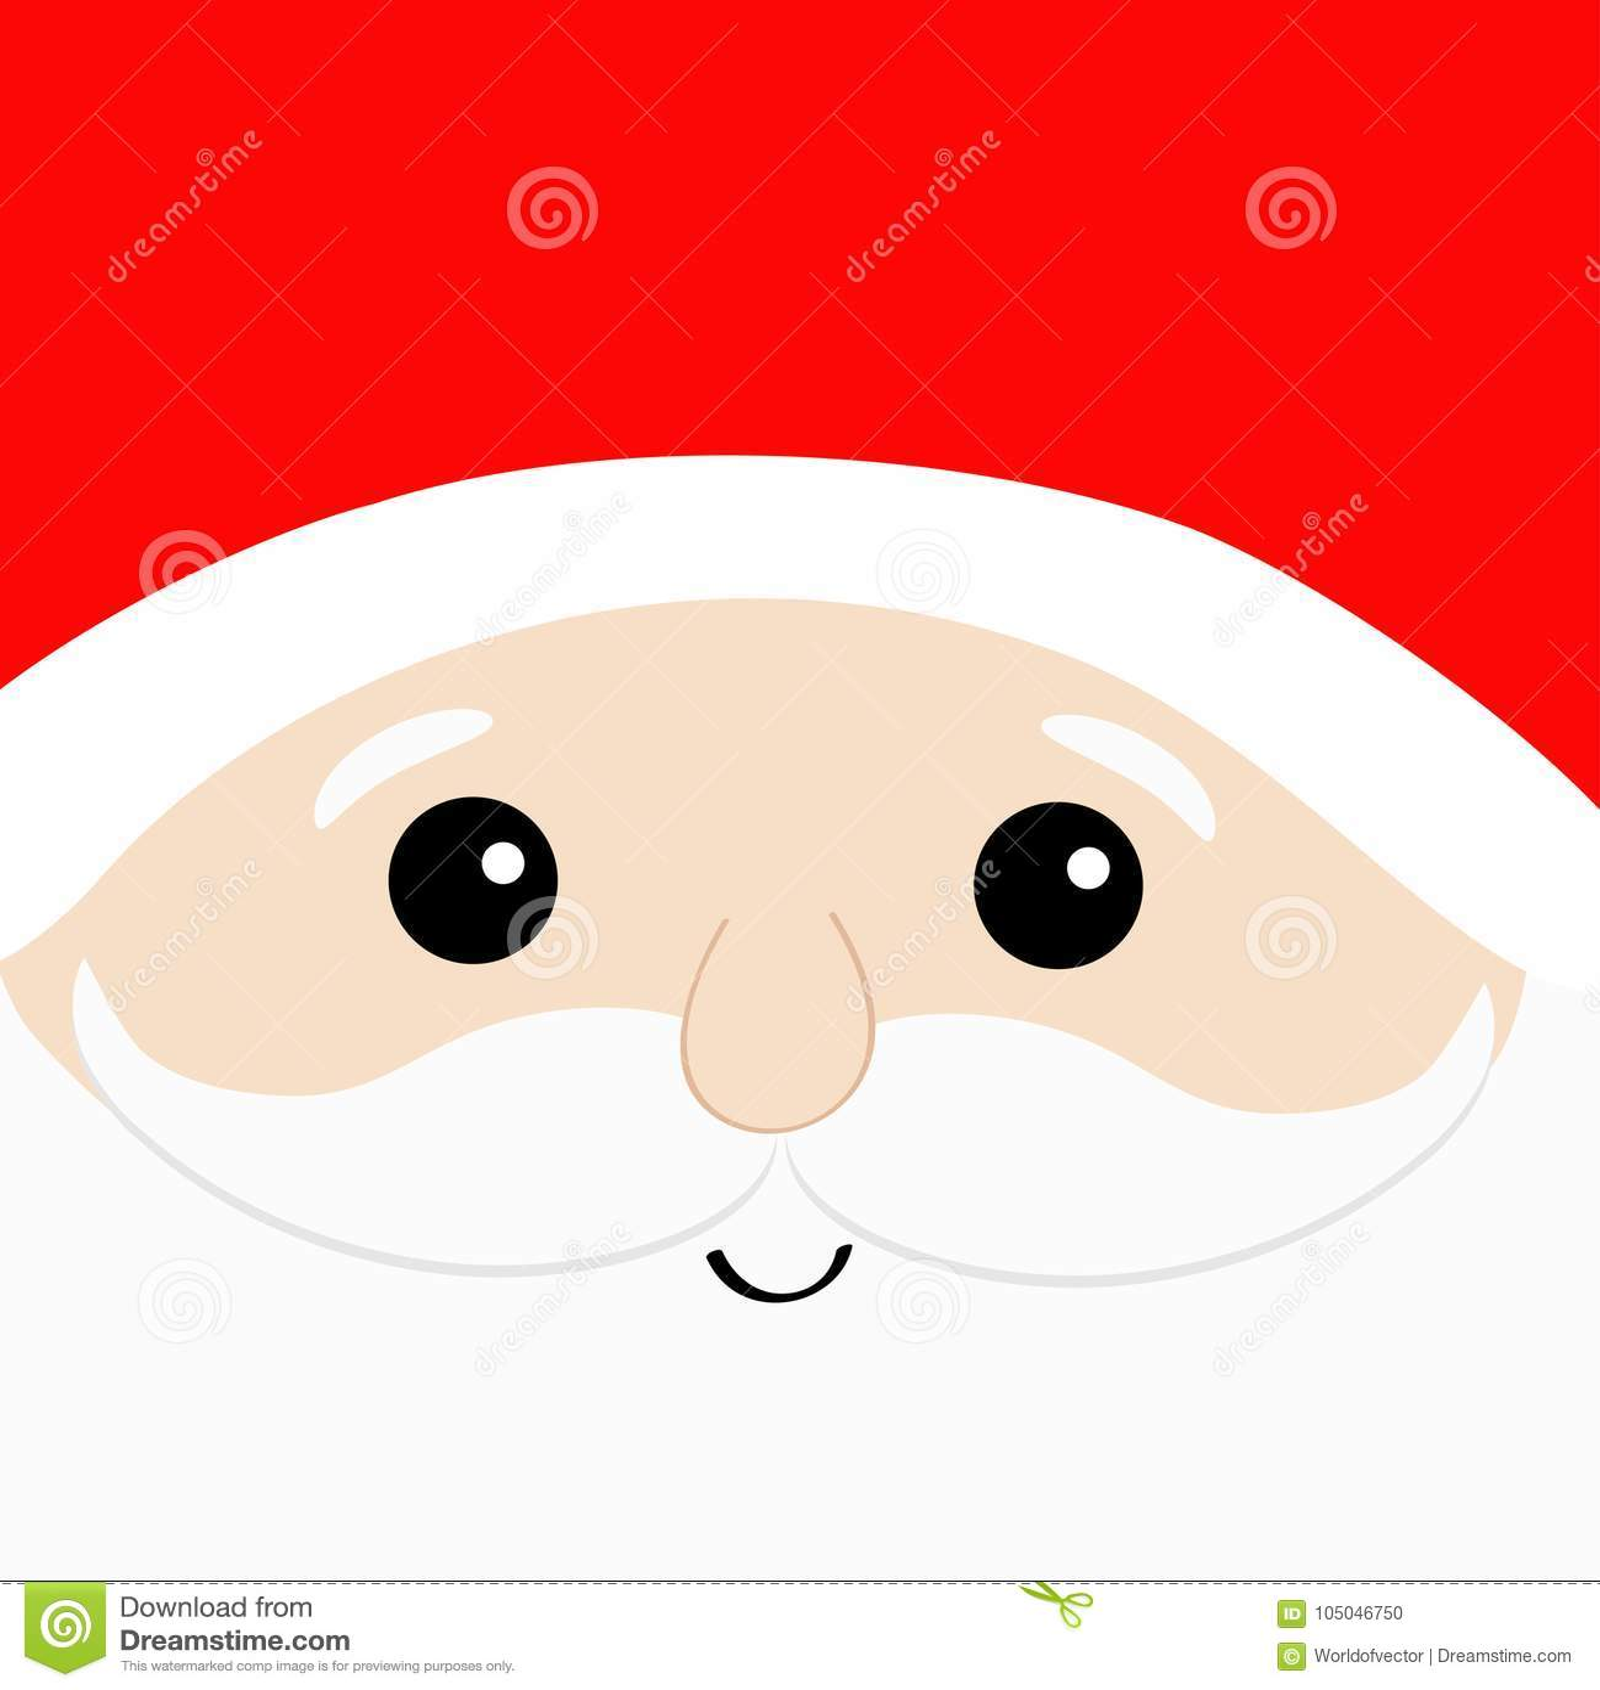 Santa Claus Big Head Face Beard Moustaches White Eyebrows Red Hat Cute Cartoon Kawaii Funny Character Merry Christmas Winte Stock Vector Illustration Of Kawaii Brow 105046750